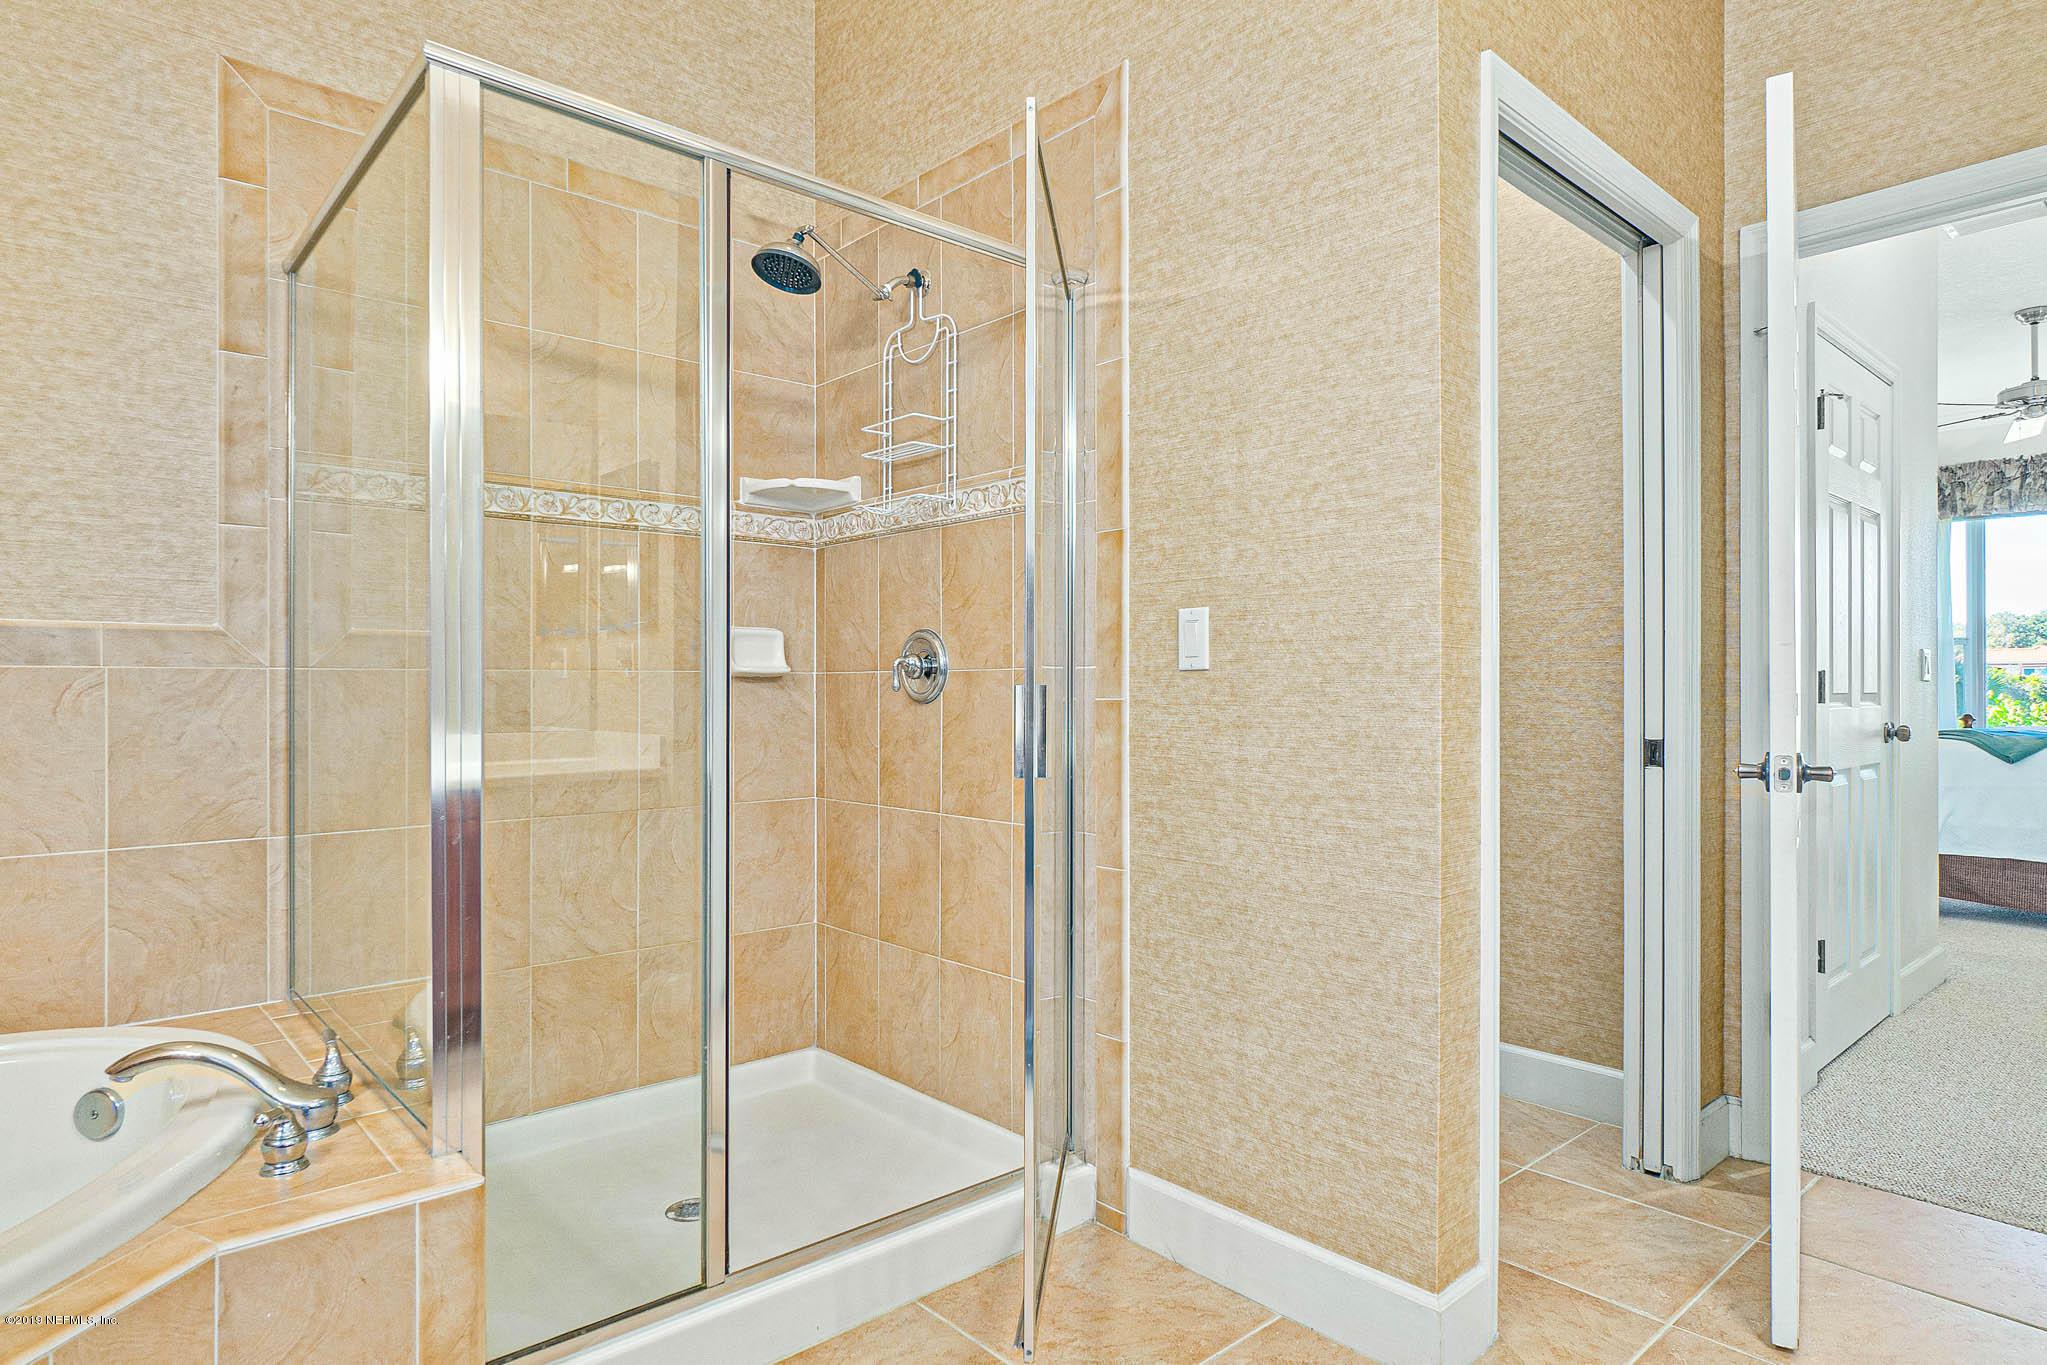 45 OCEAN CREST, PALM COAST, FLORIDA 32137, 3 Bedrooms Bedrooms, ,2 BathroomsBathrooms,Residential,For sale,OCEAN CREST,1028384